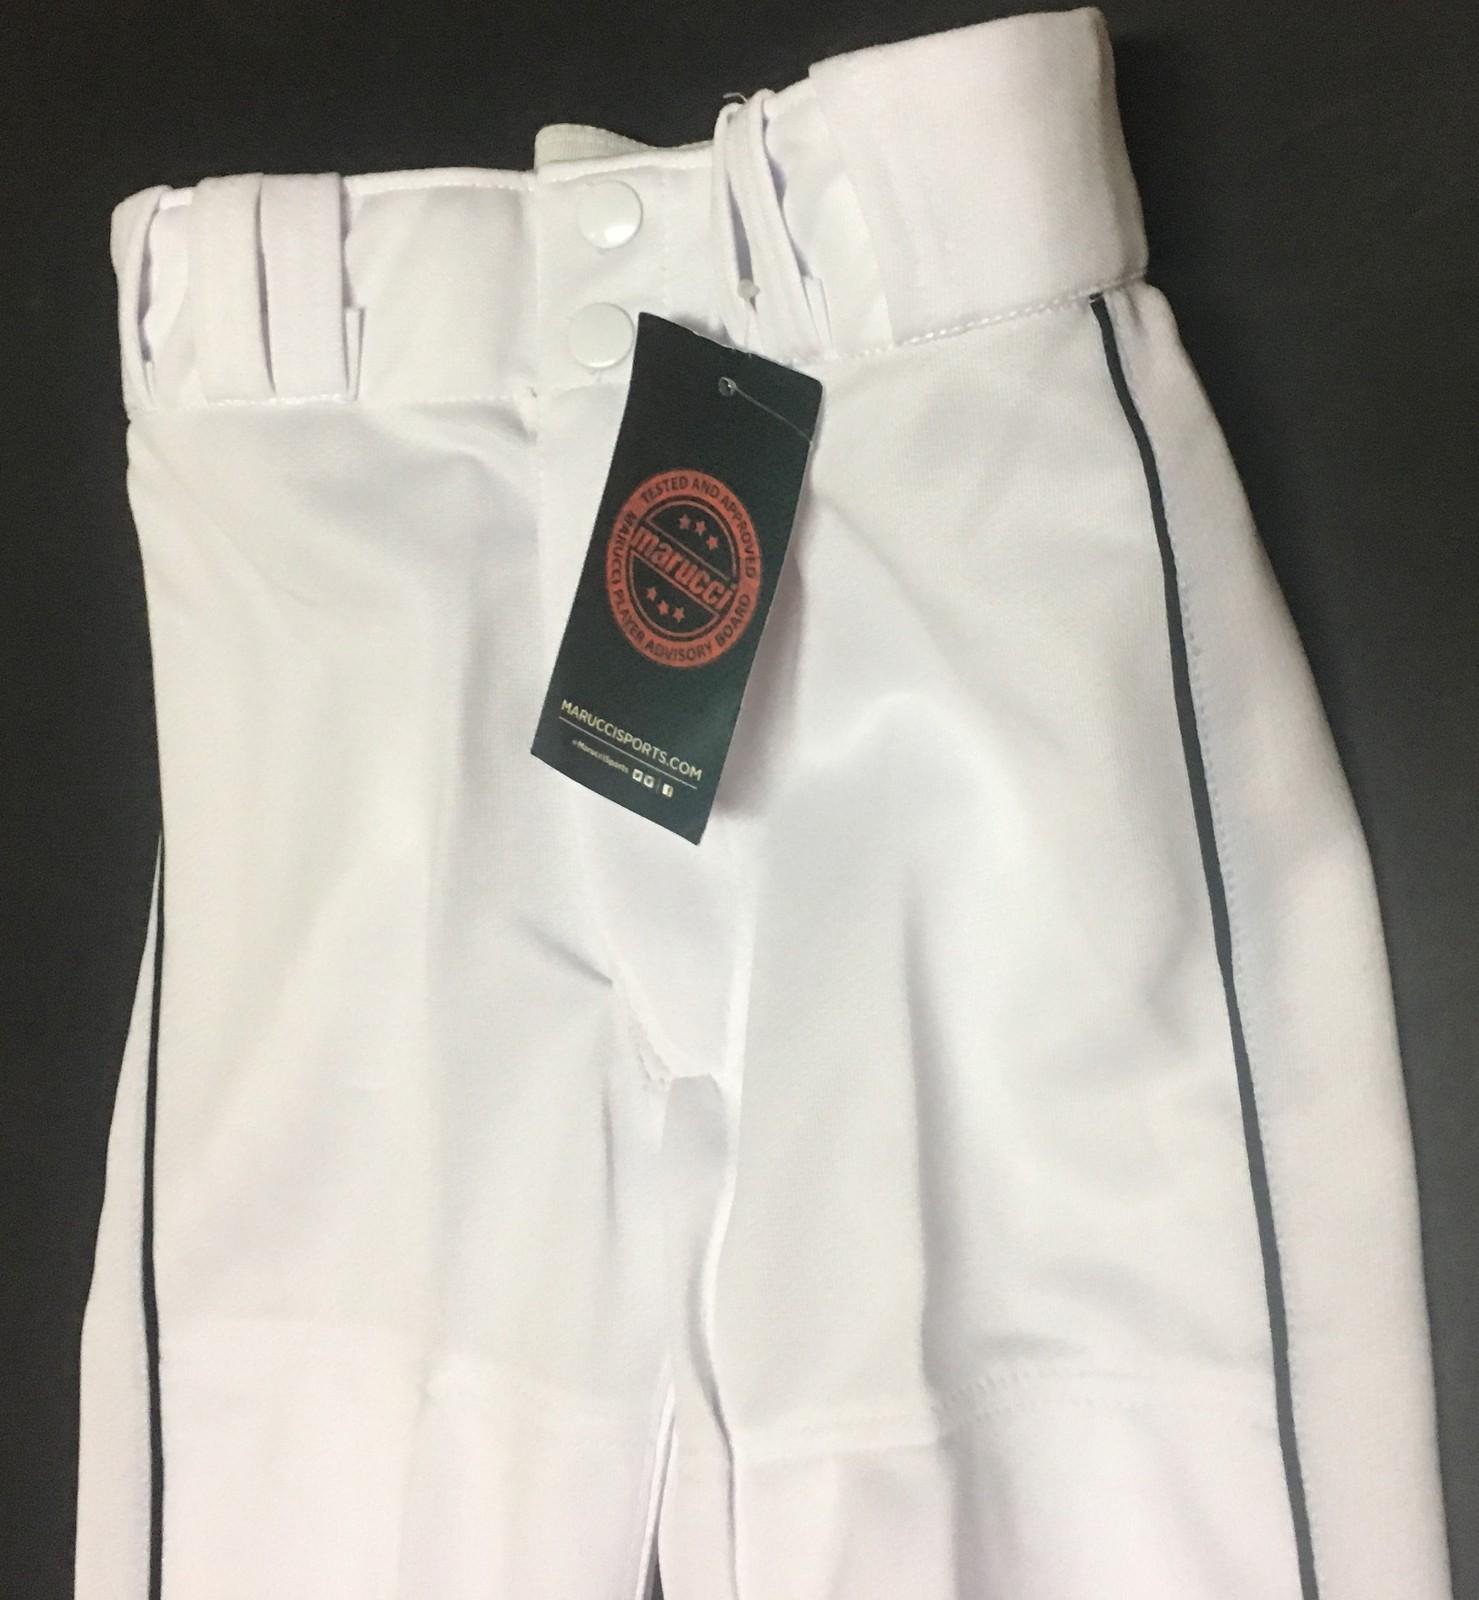 Marucci Youth Baseball Pants Youth Size Small NWT White w/Black Trim